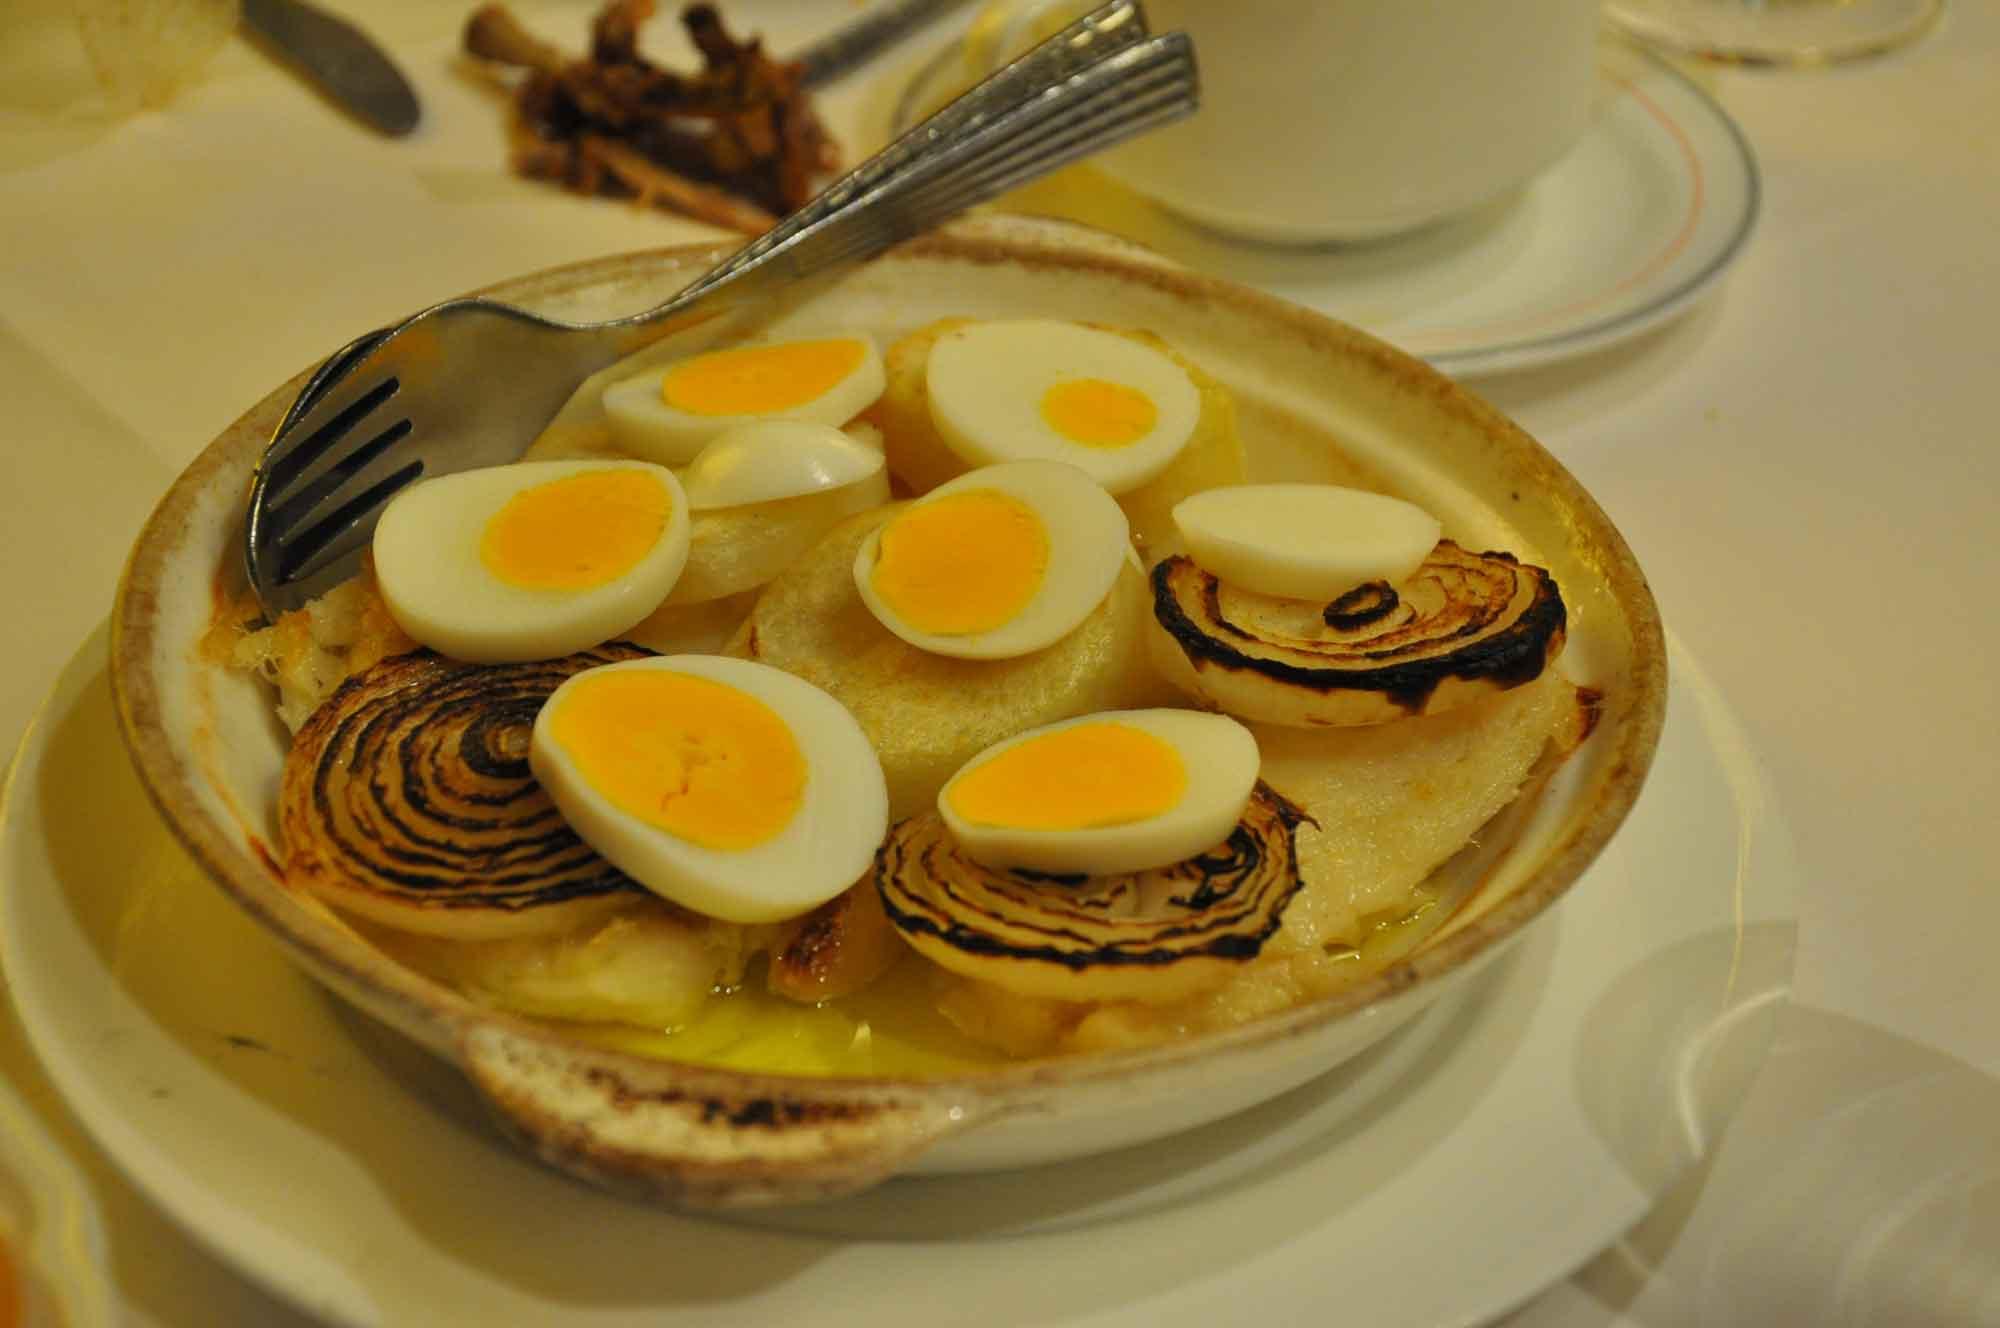 Fat Siu Lau baked cod